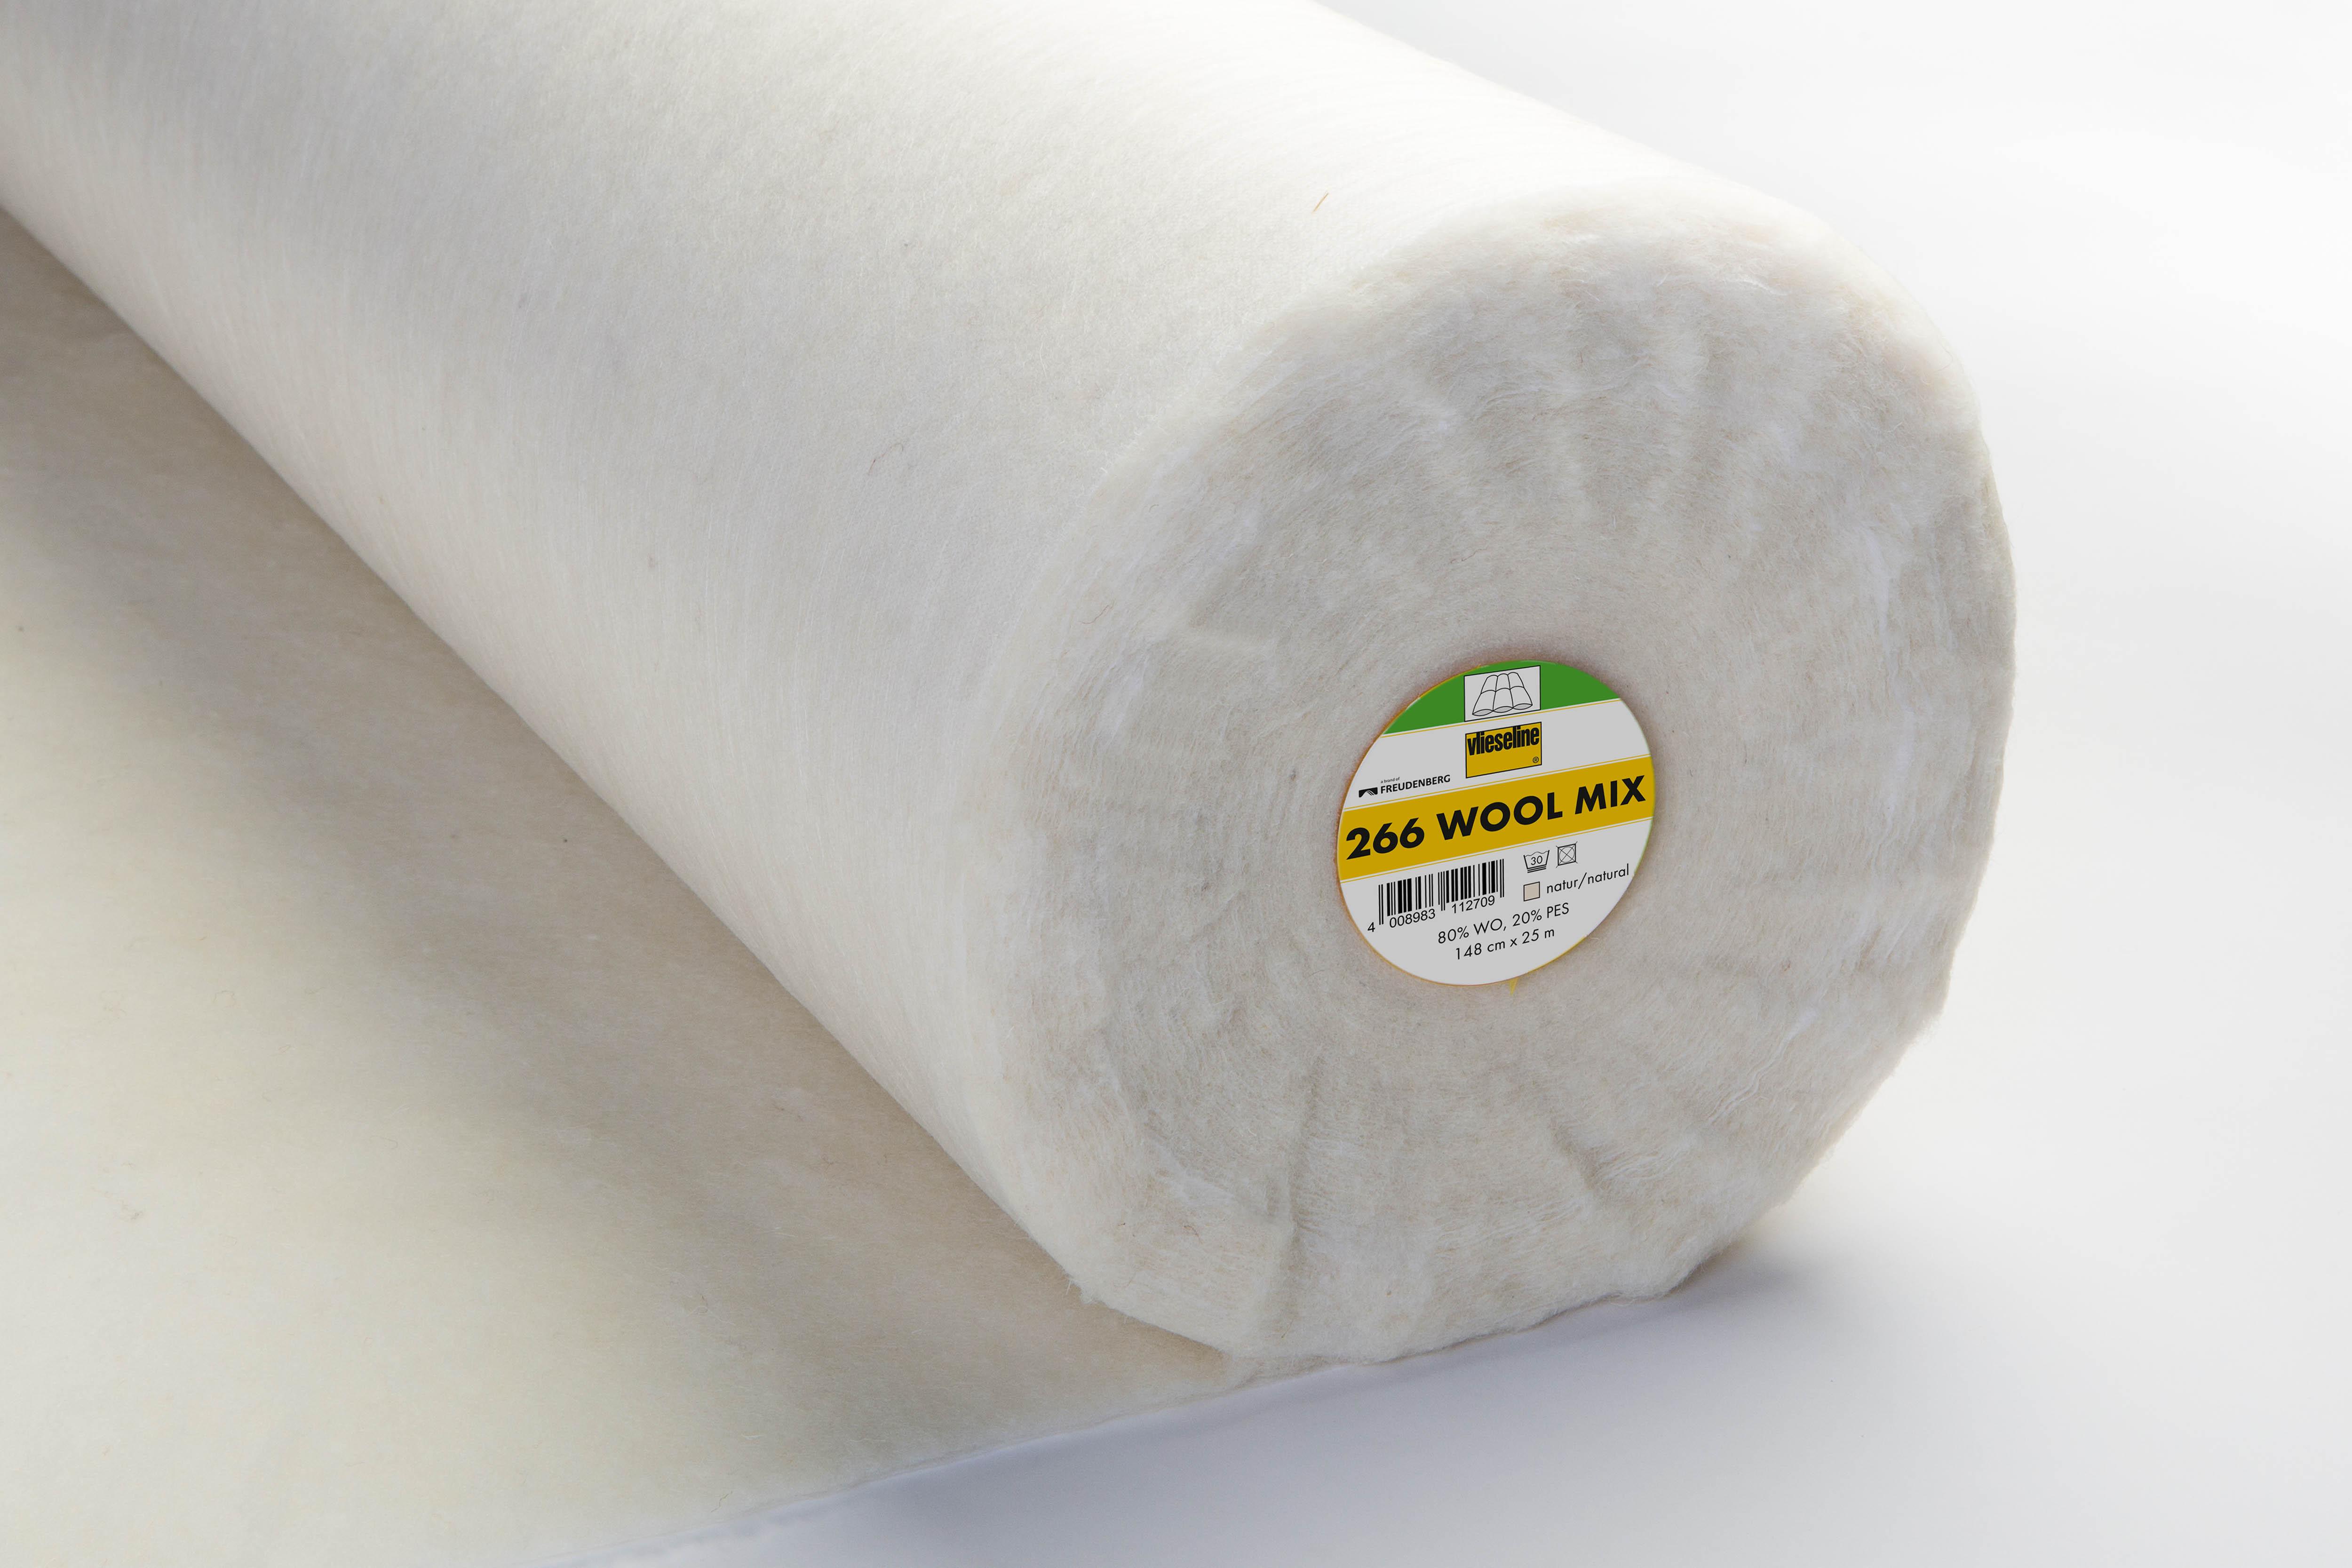 Naturvolumenvlies 266 Wool Mix